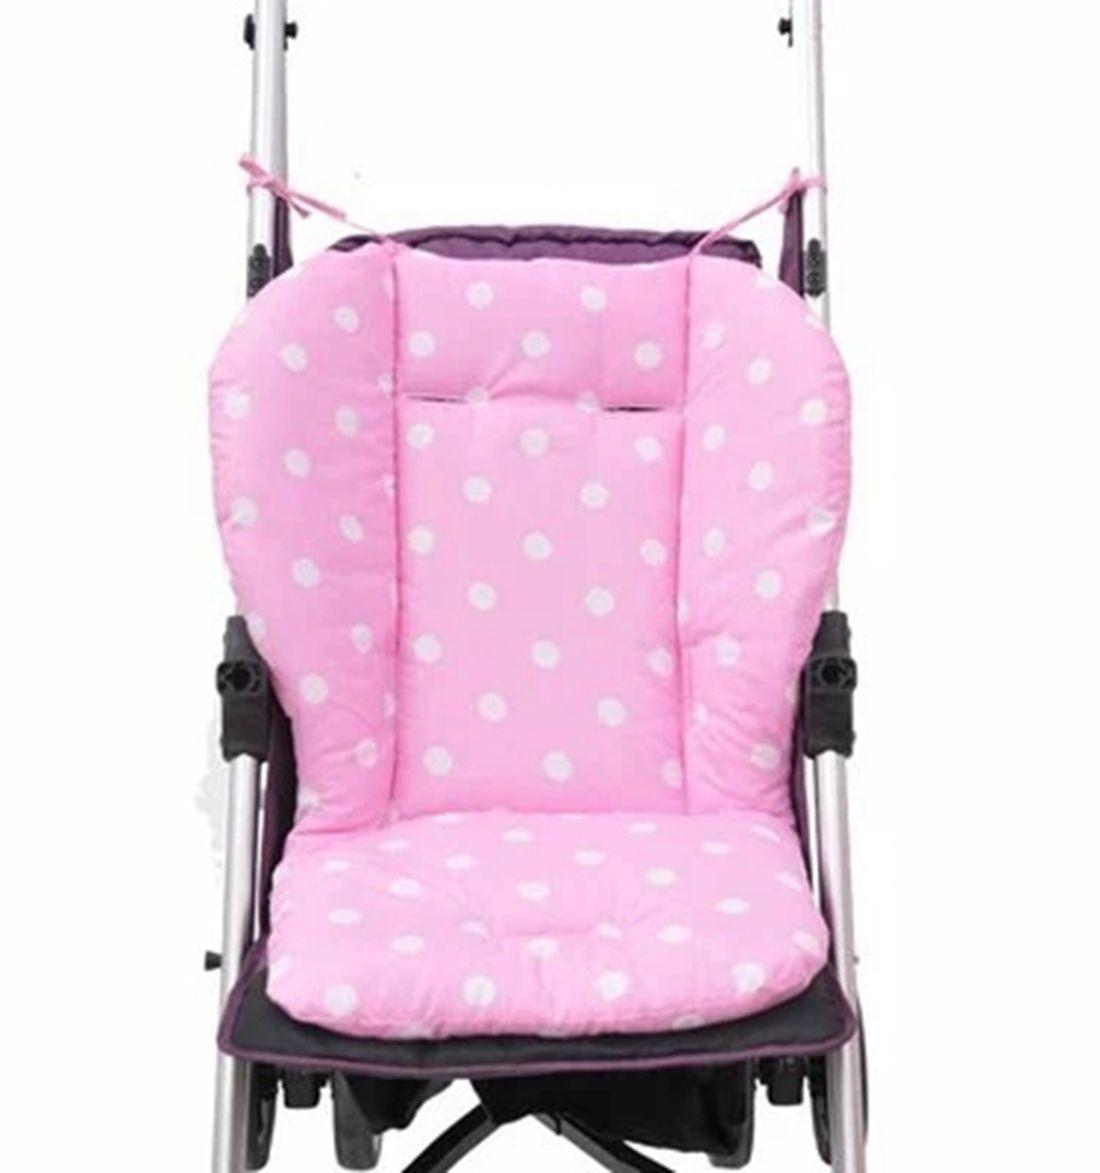 Newborn Baby Kid Stroller Car Seat Pram Cushion Chair Pad Liner Mat Body Support